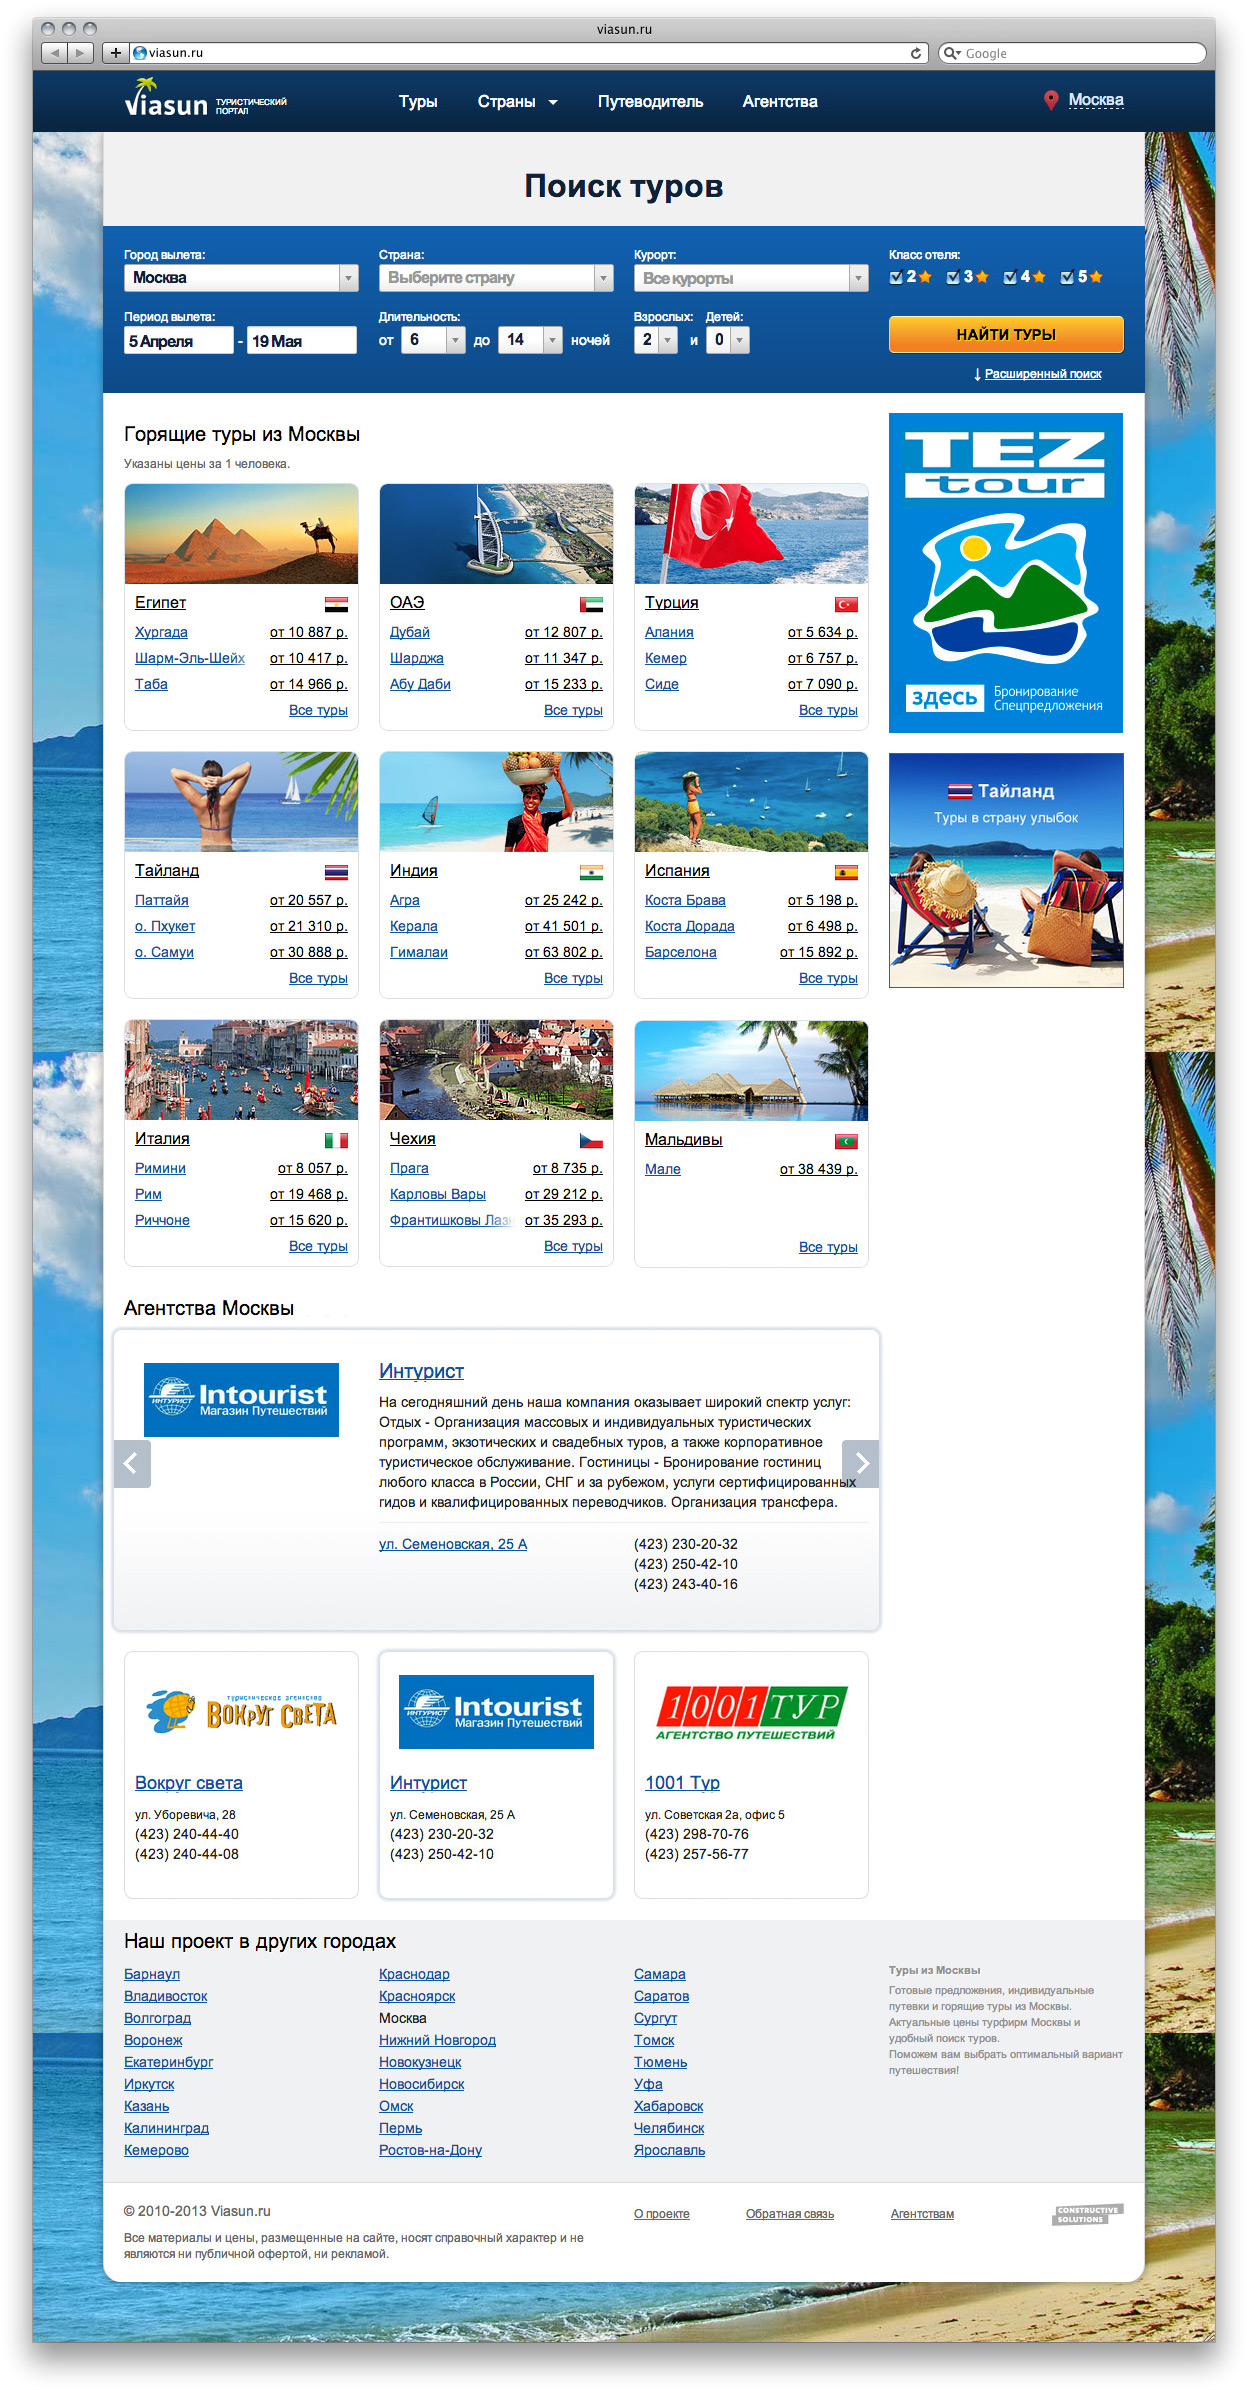 Туристический портал Viasun.ru